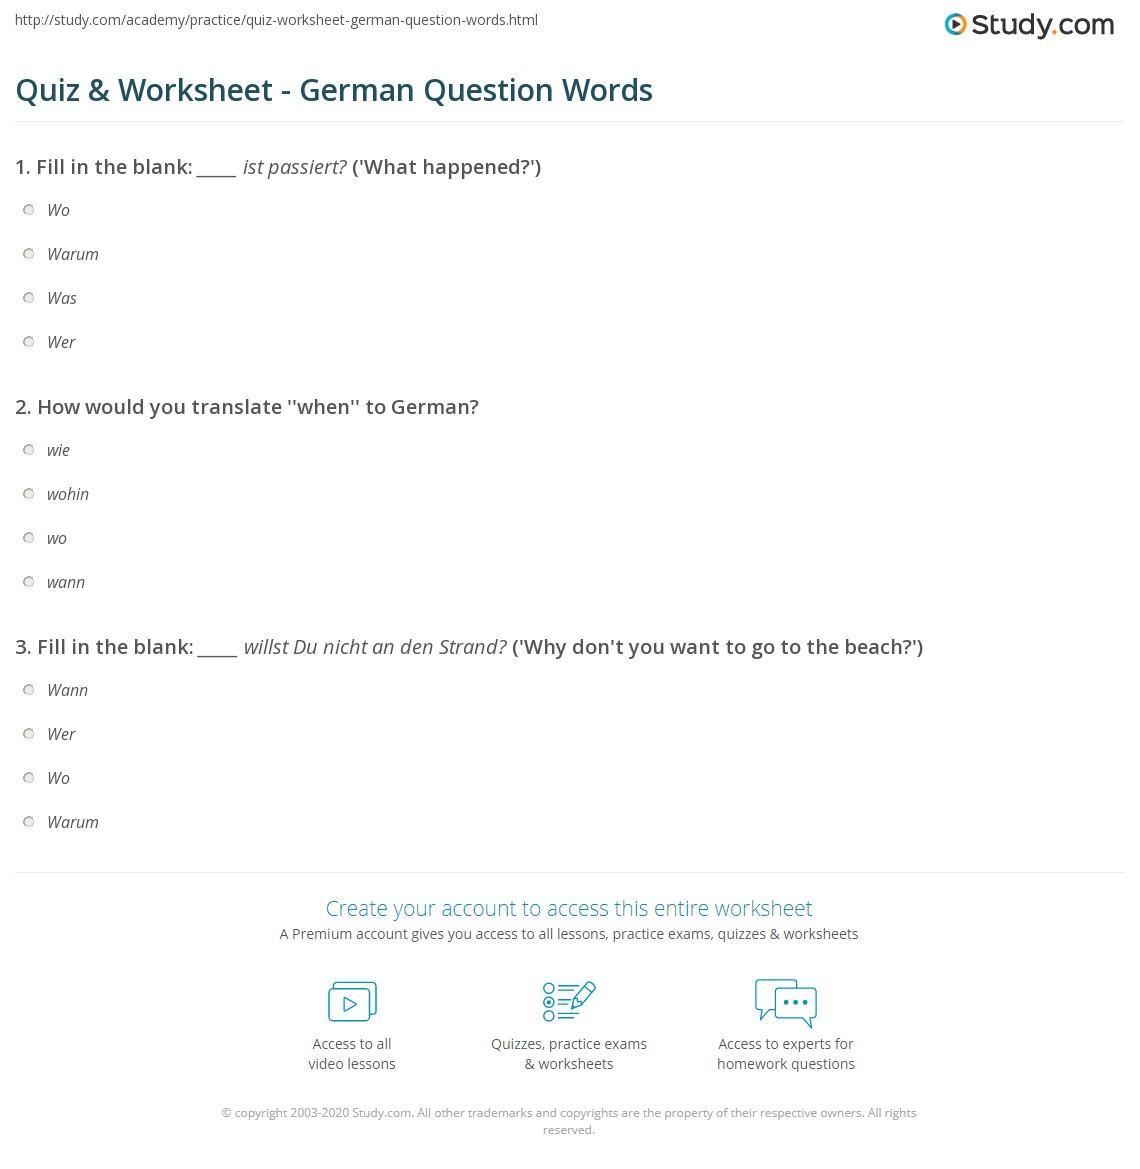 Quiz & Worksheet - German Question Words | Study.com